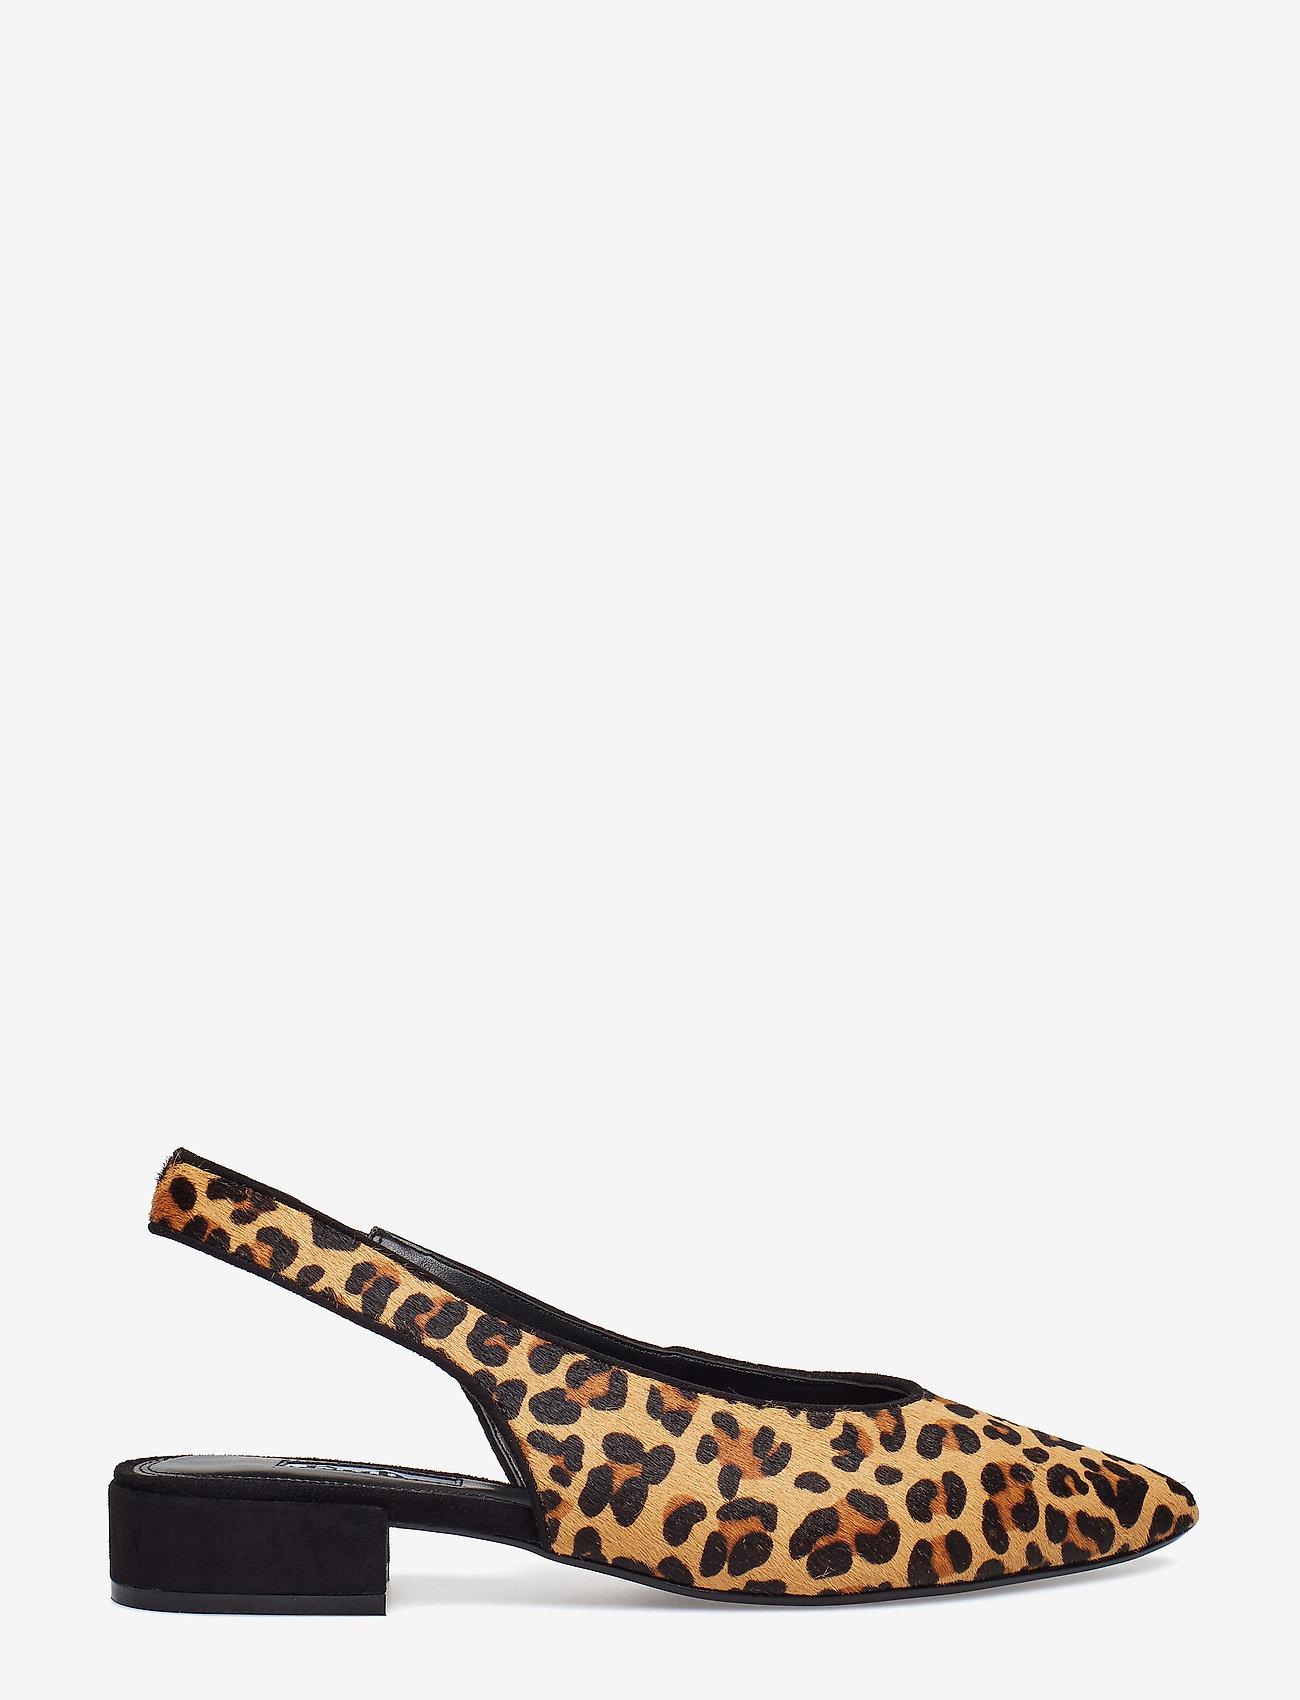 Dune London - CELENE - ballerines - leopard-leather